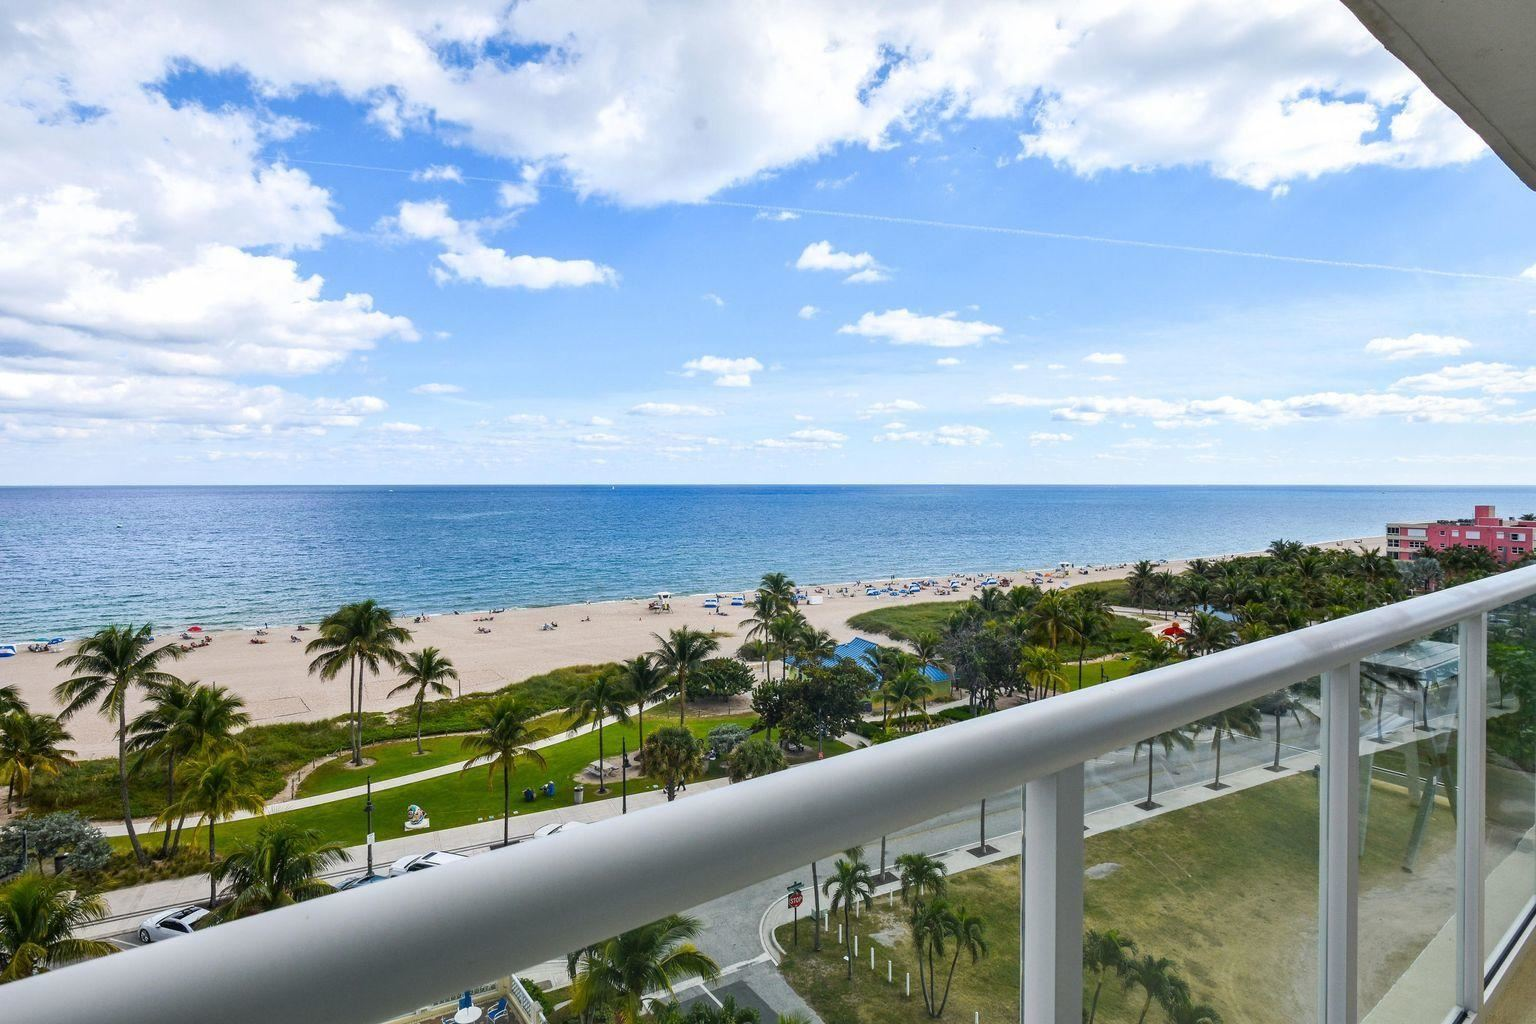 111 N Pompano Beach Boulevard #814, Pompano Beach, FL 33062 - MLS#: RX-10693172